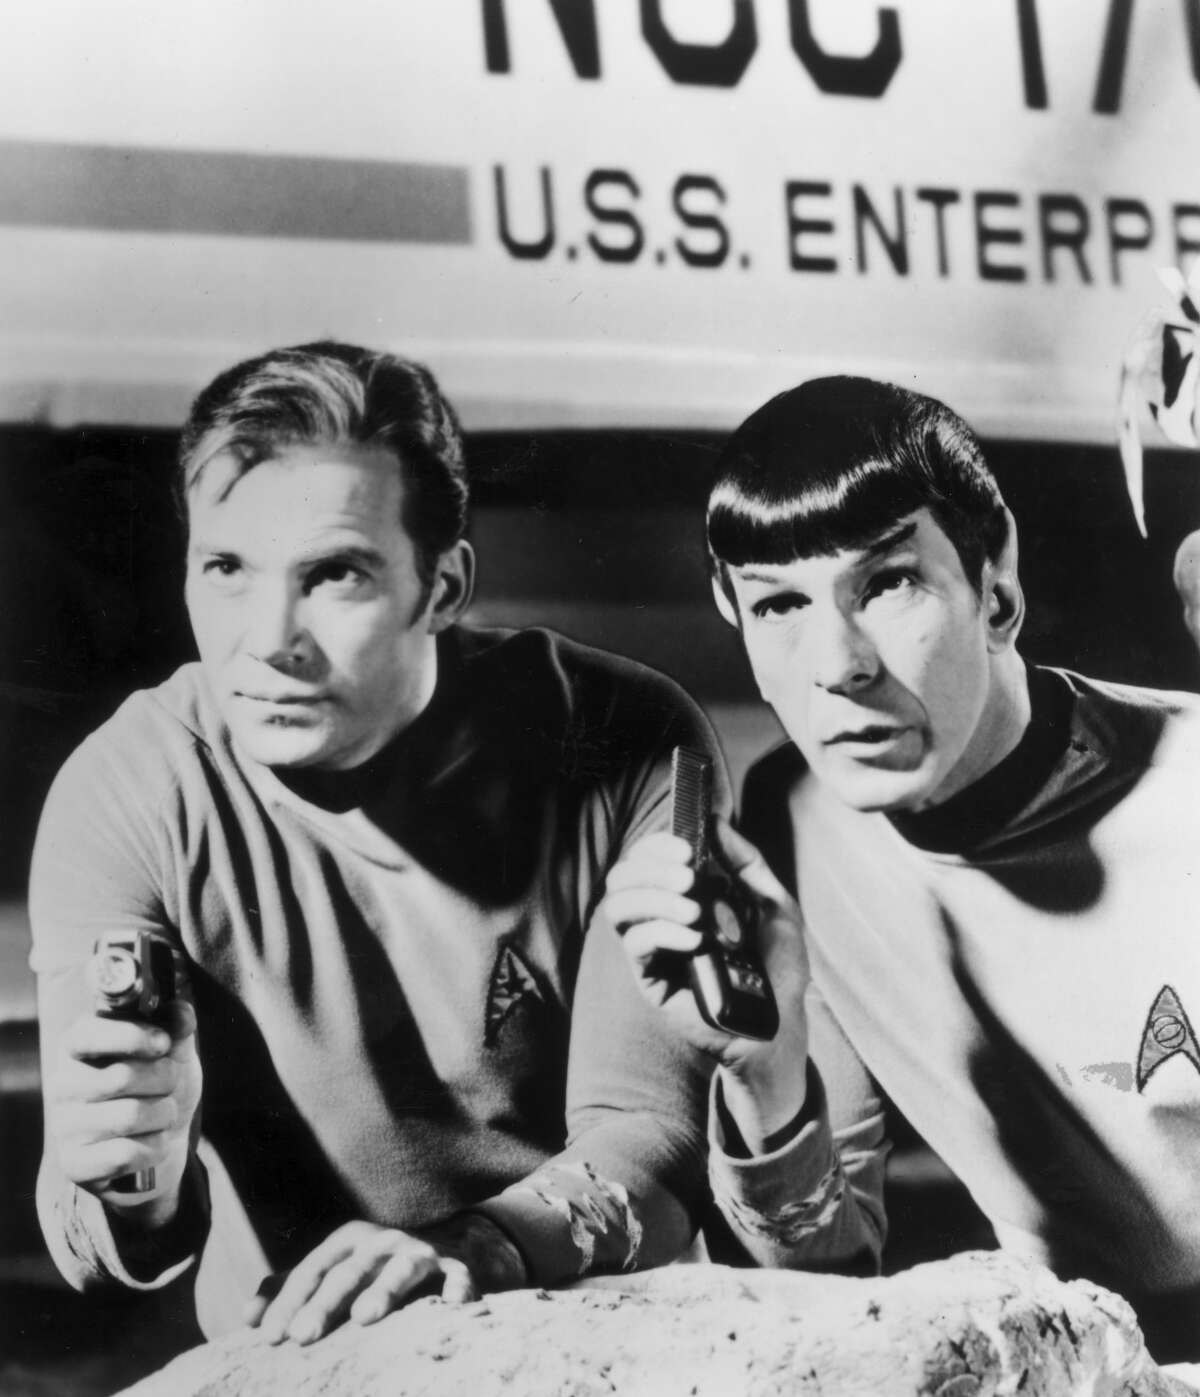 Kirk (William Shatner) and Spock (Leonard Nimoy).